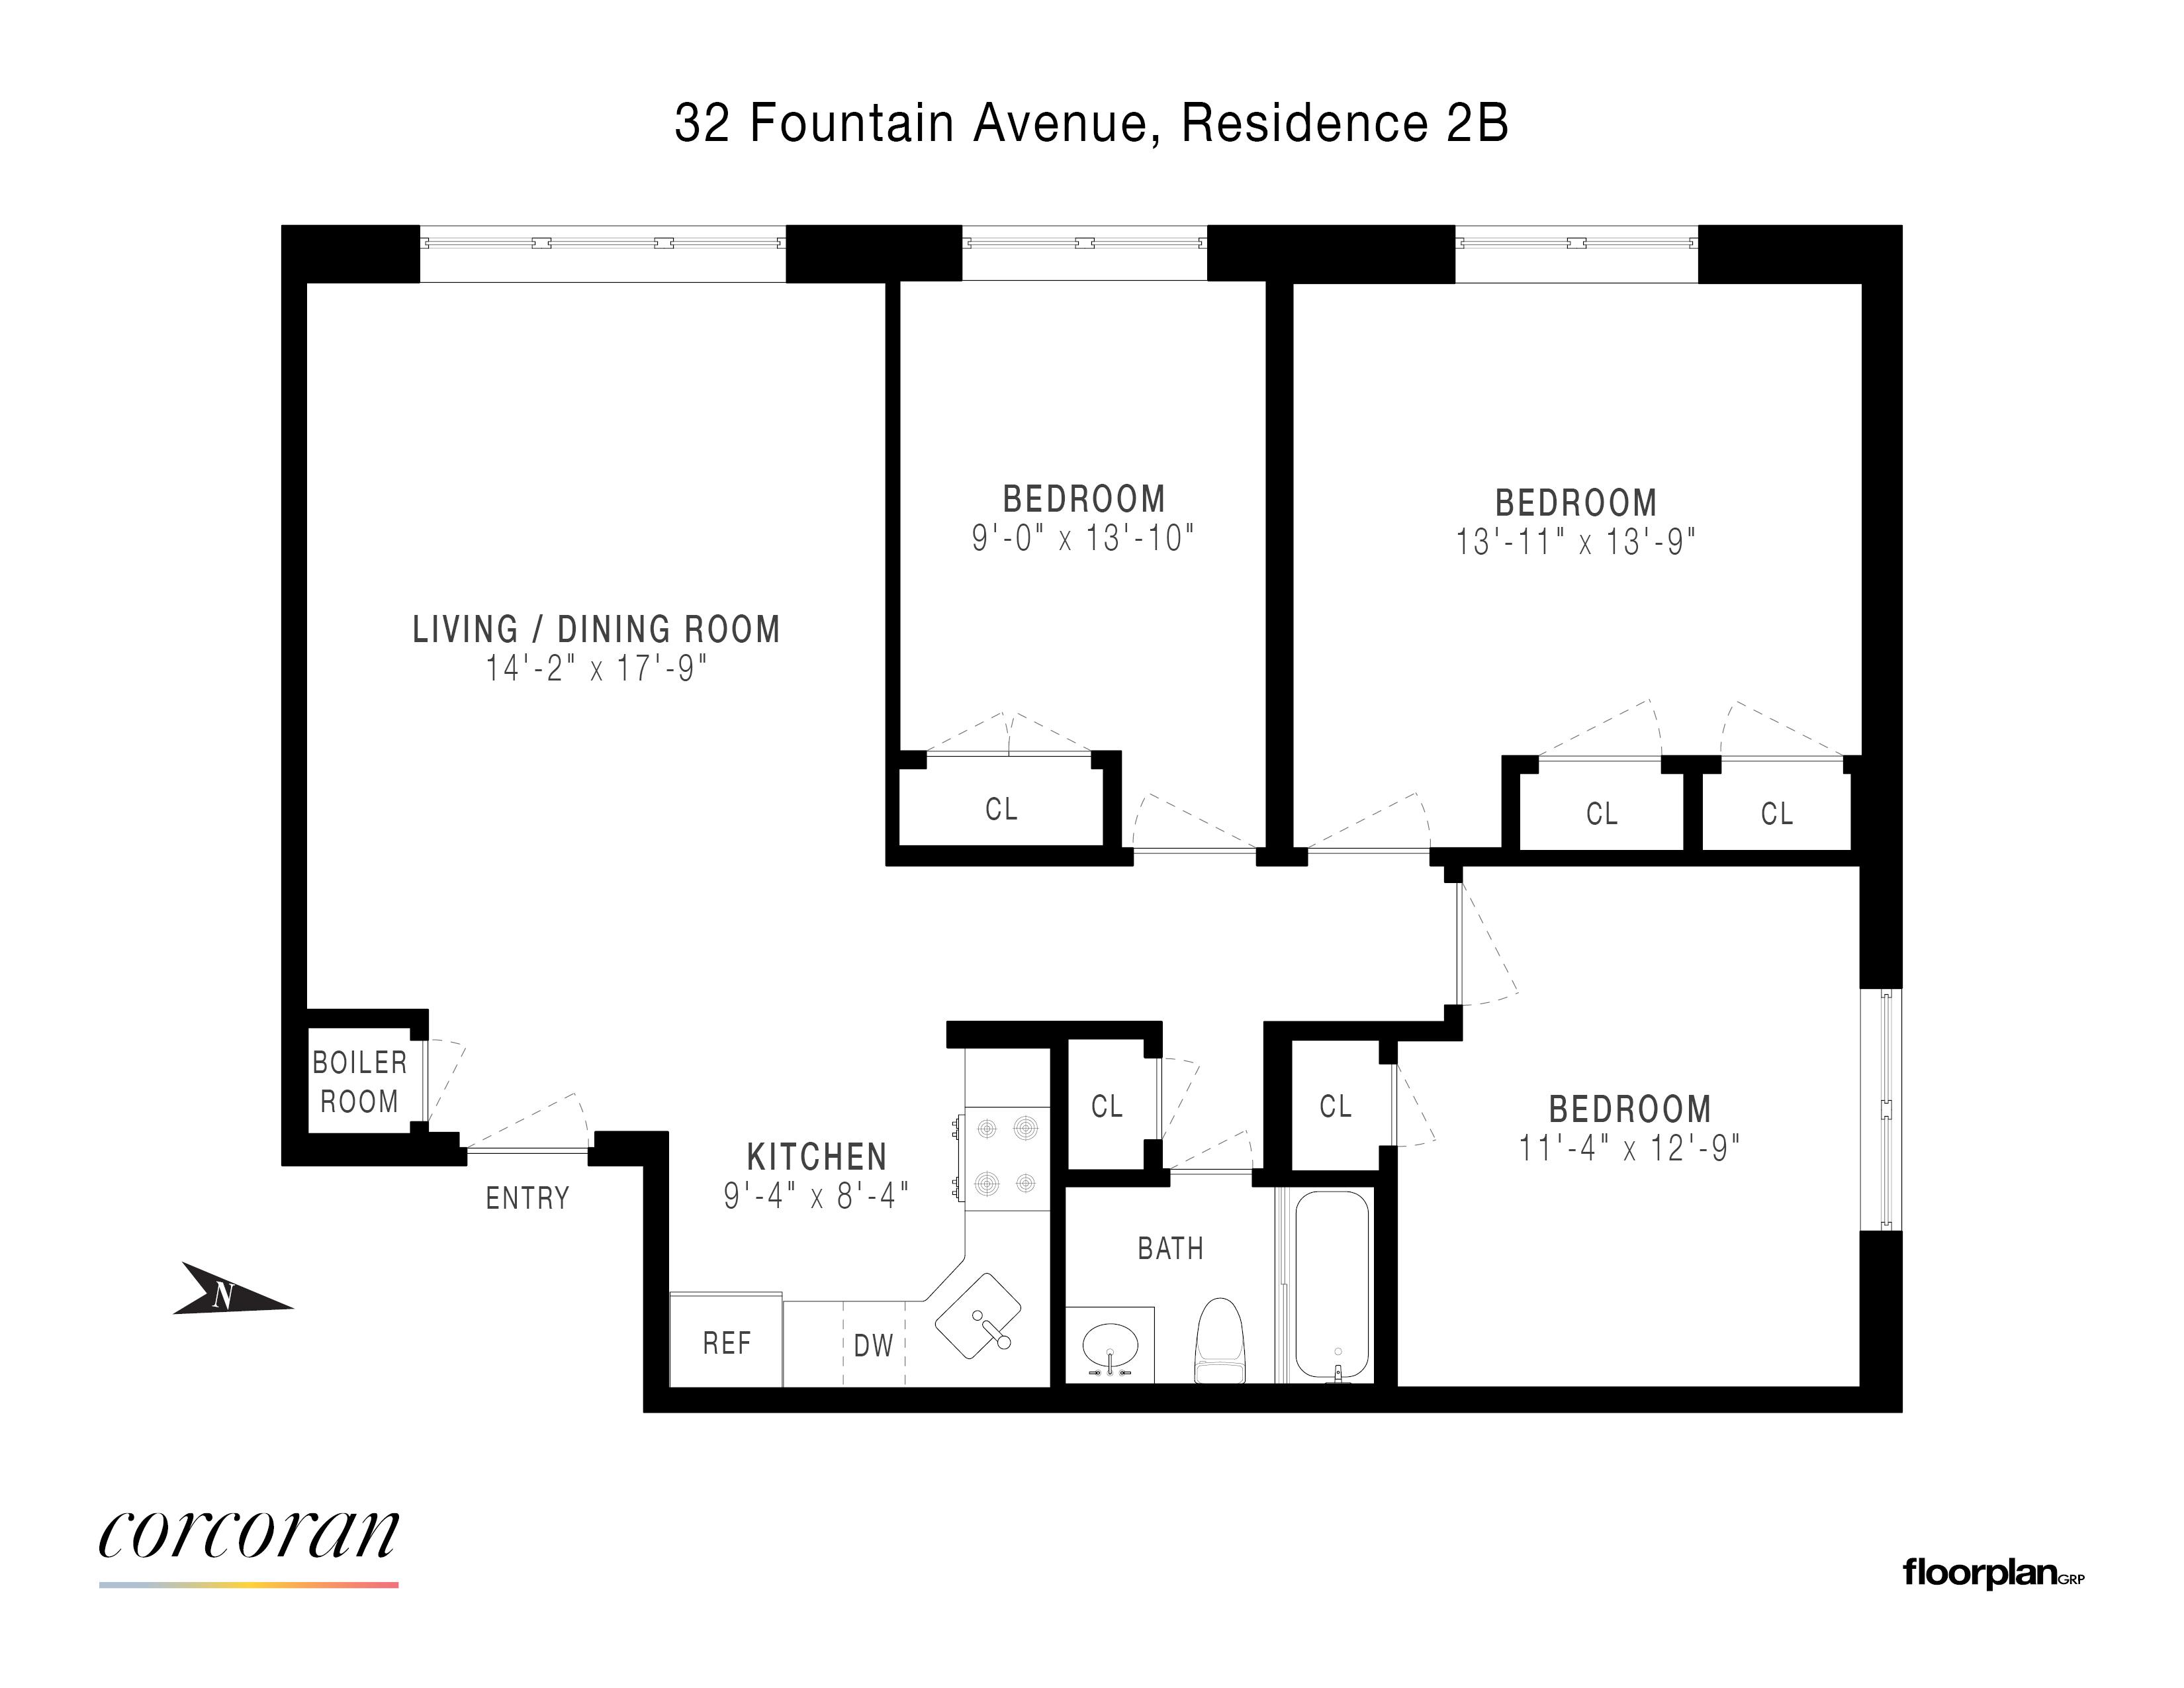 32 Fountain Avenue East New York Brooklyn NY 11208